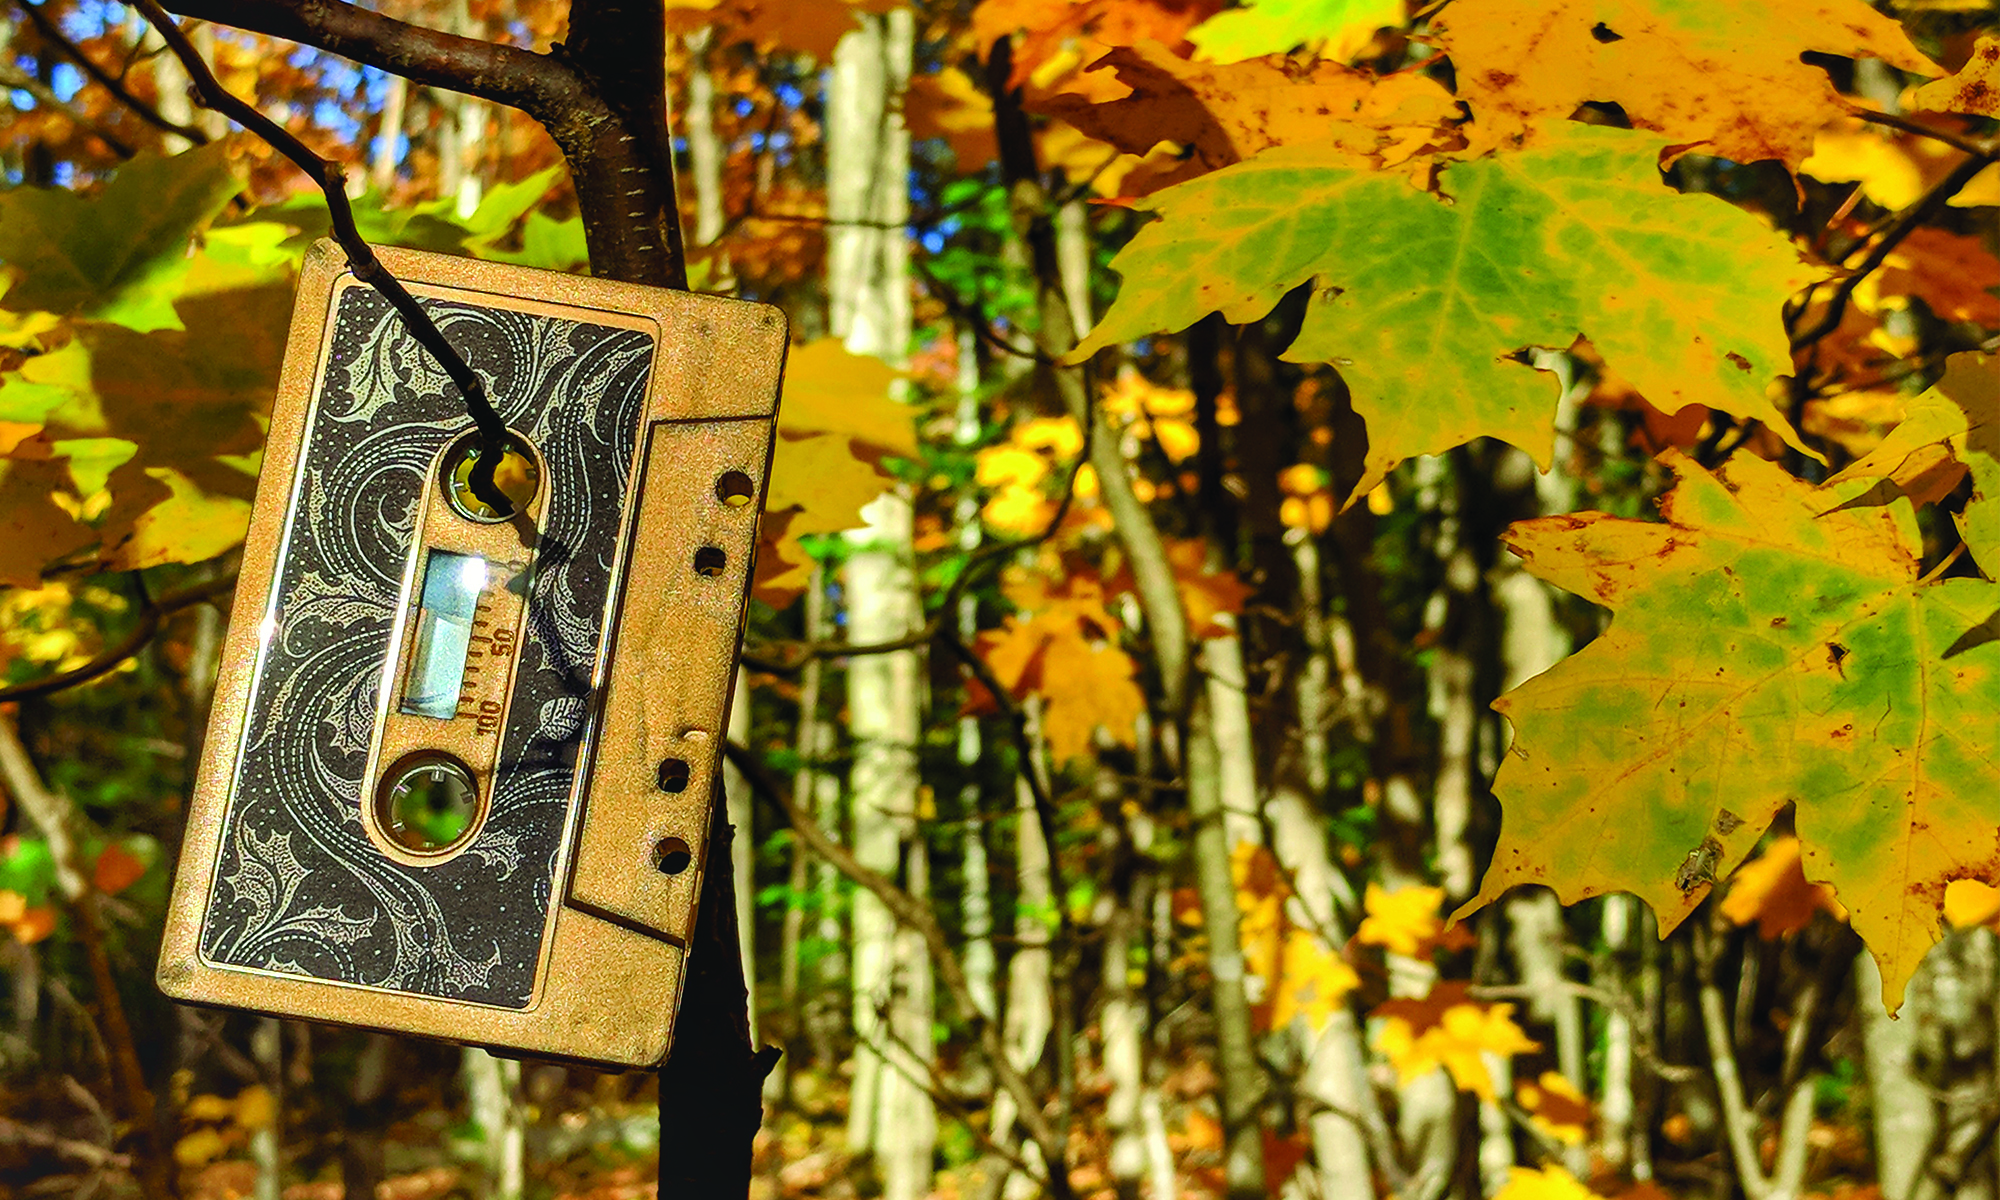 Reverb Adrenaline Cassette Tape Review - Northern Sludge